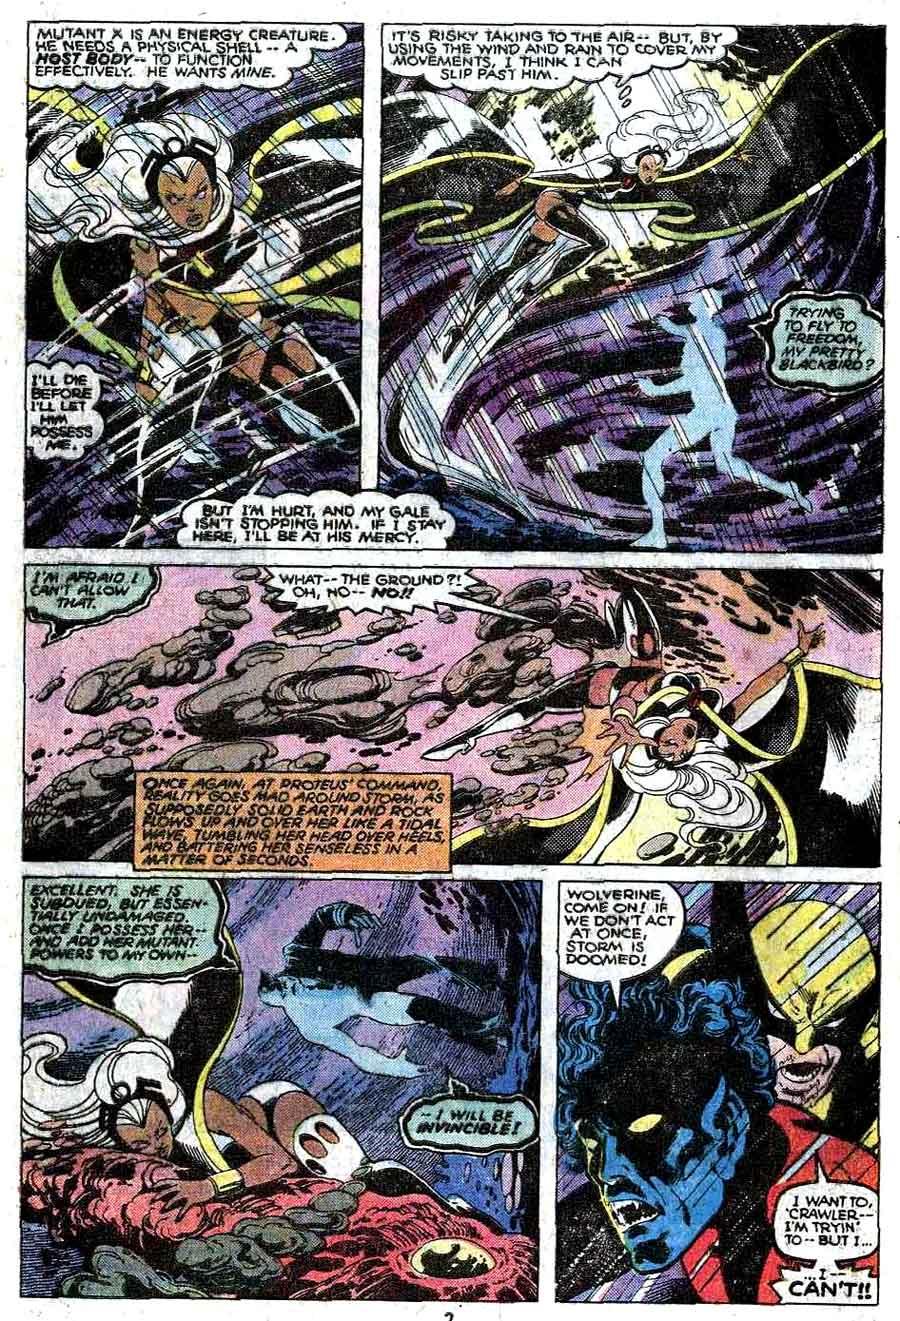 X-men v1 #127 marvel comic book page art by John Byrne